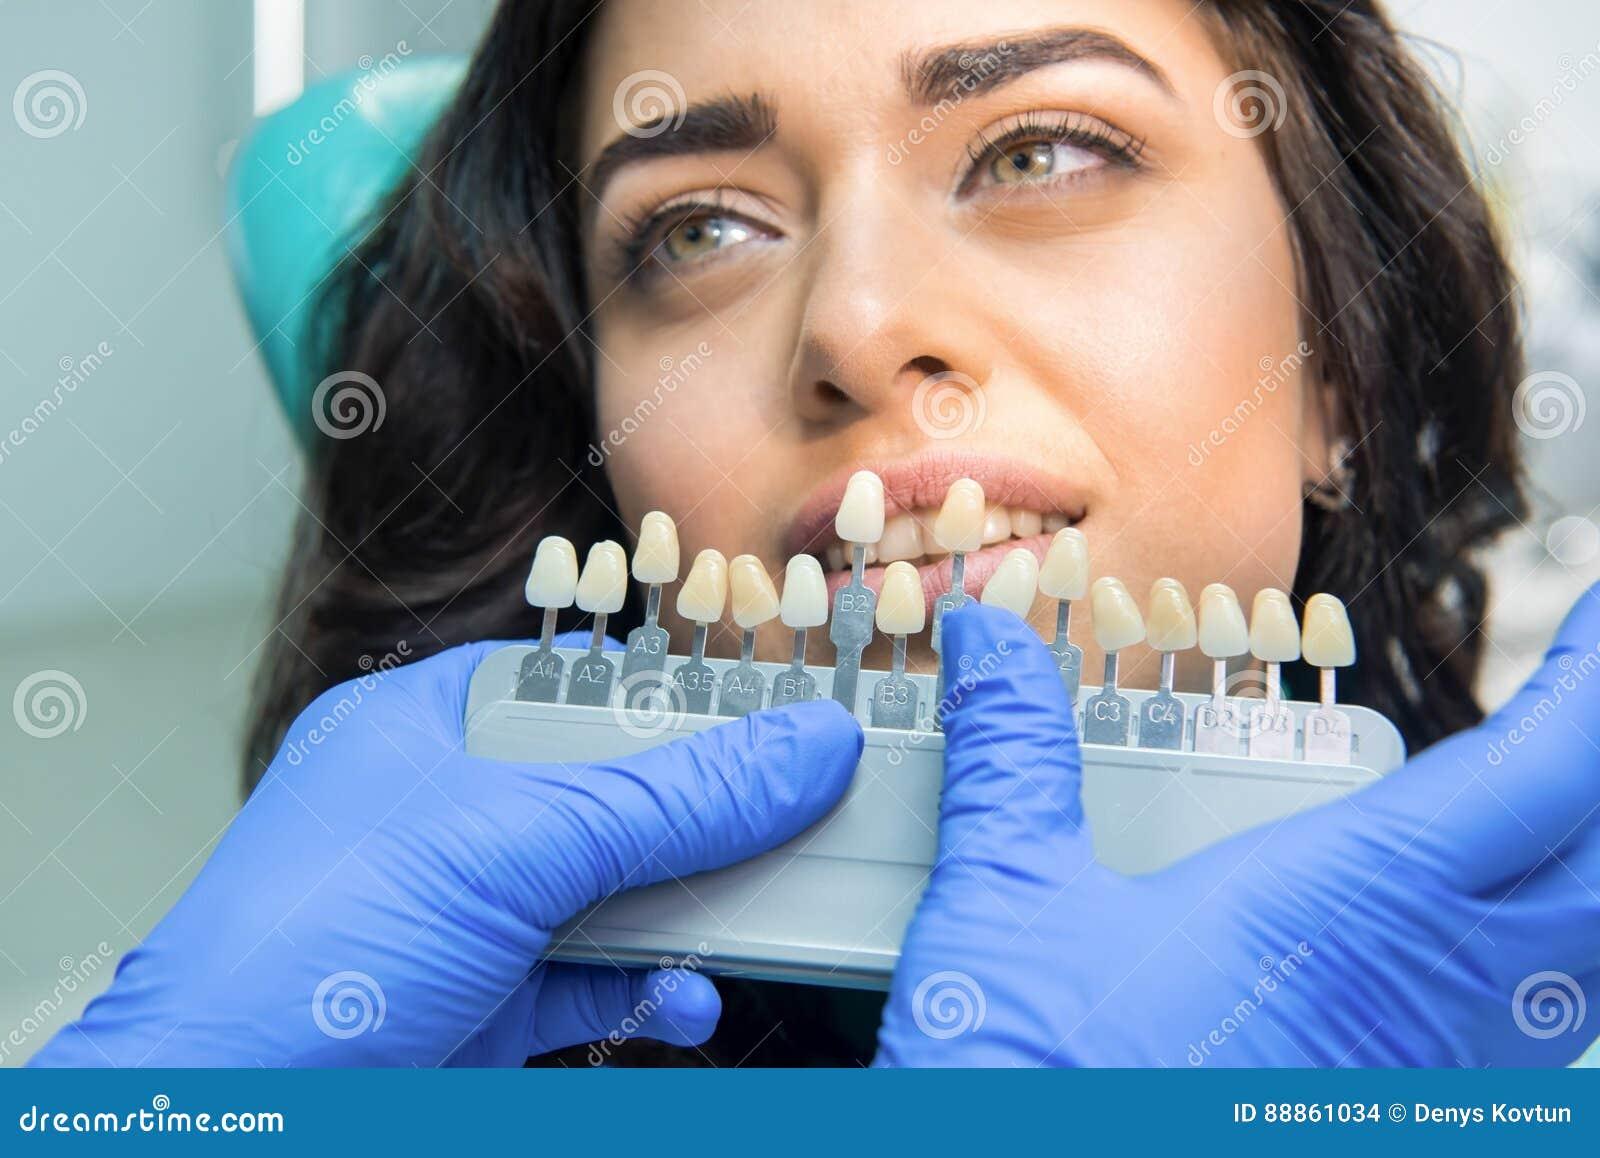 Teeth Color Chart Stock Photo Image Of Hygiene Customer 88861034